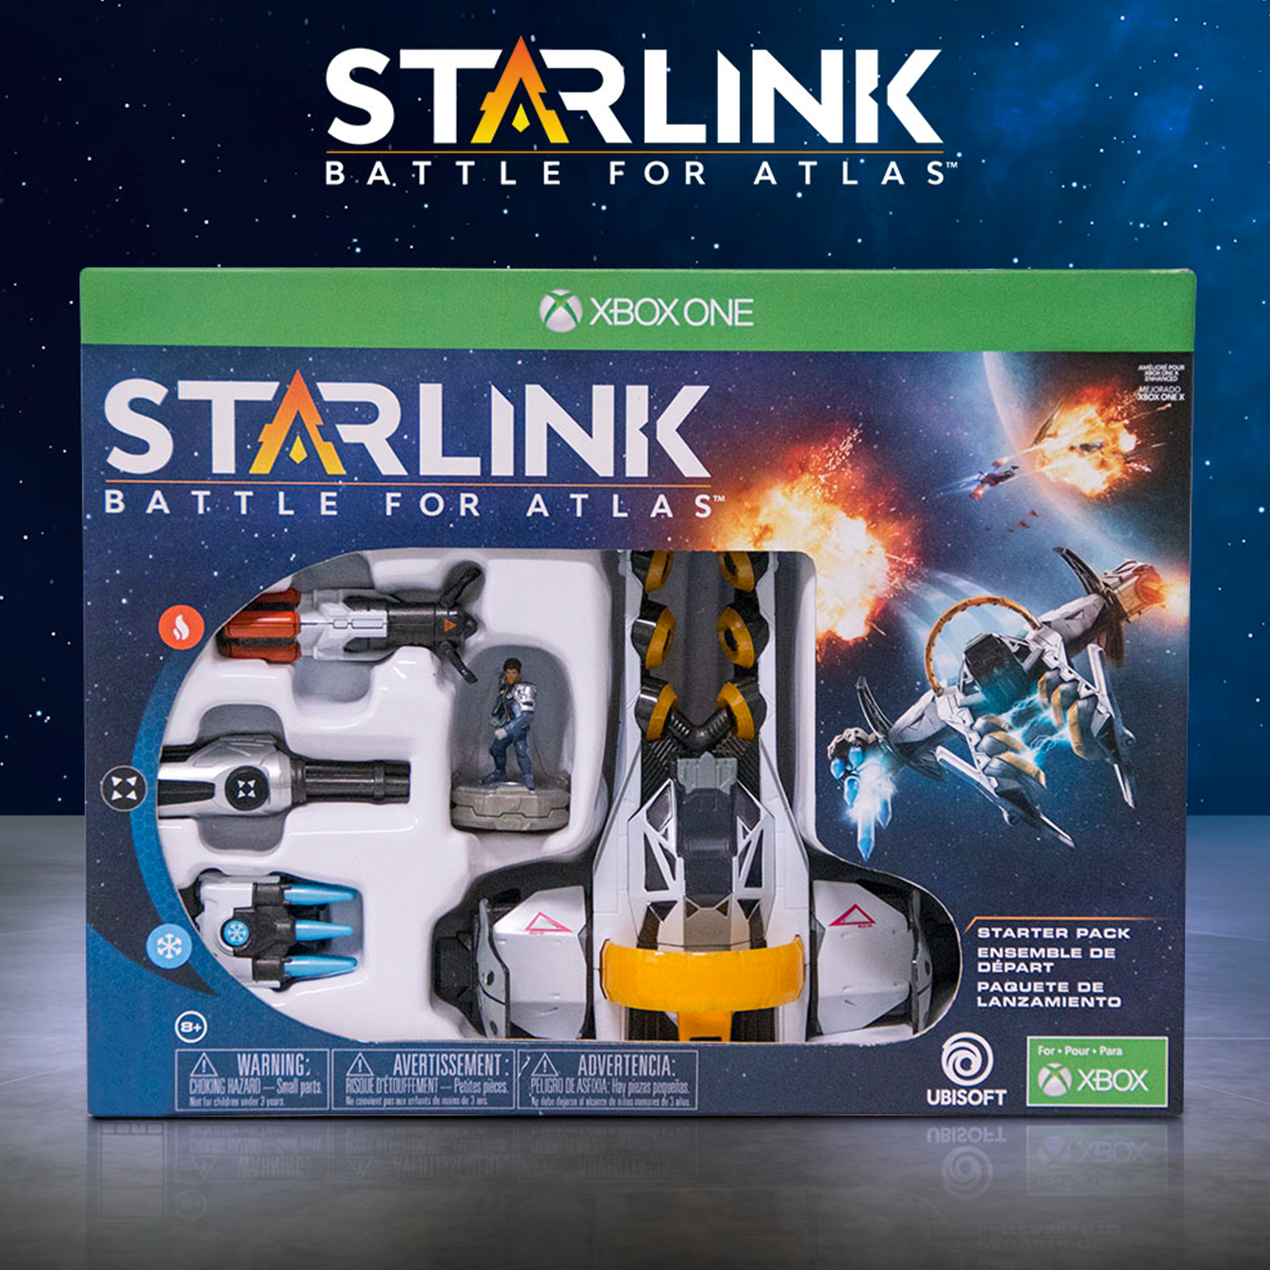 Buy Starlink: Battle for Atlas Starter Pack for Xbox One - Microsoft Store